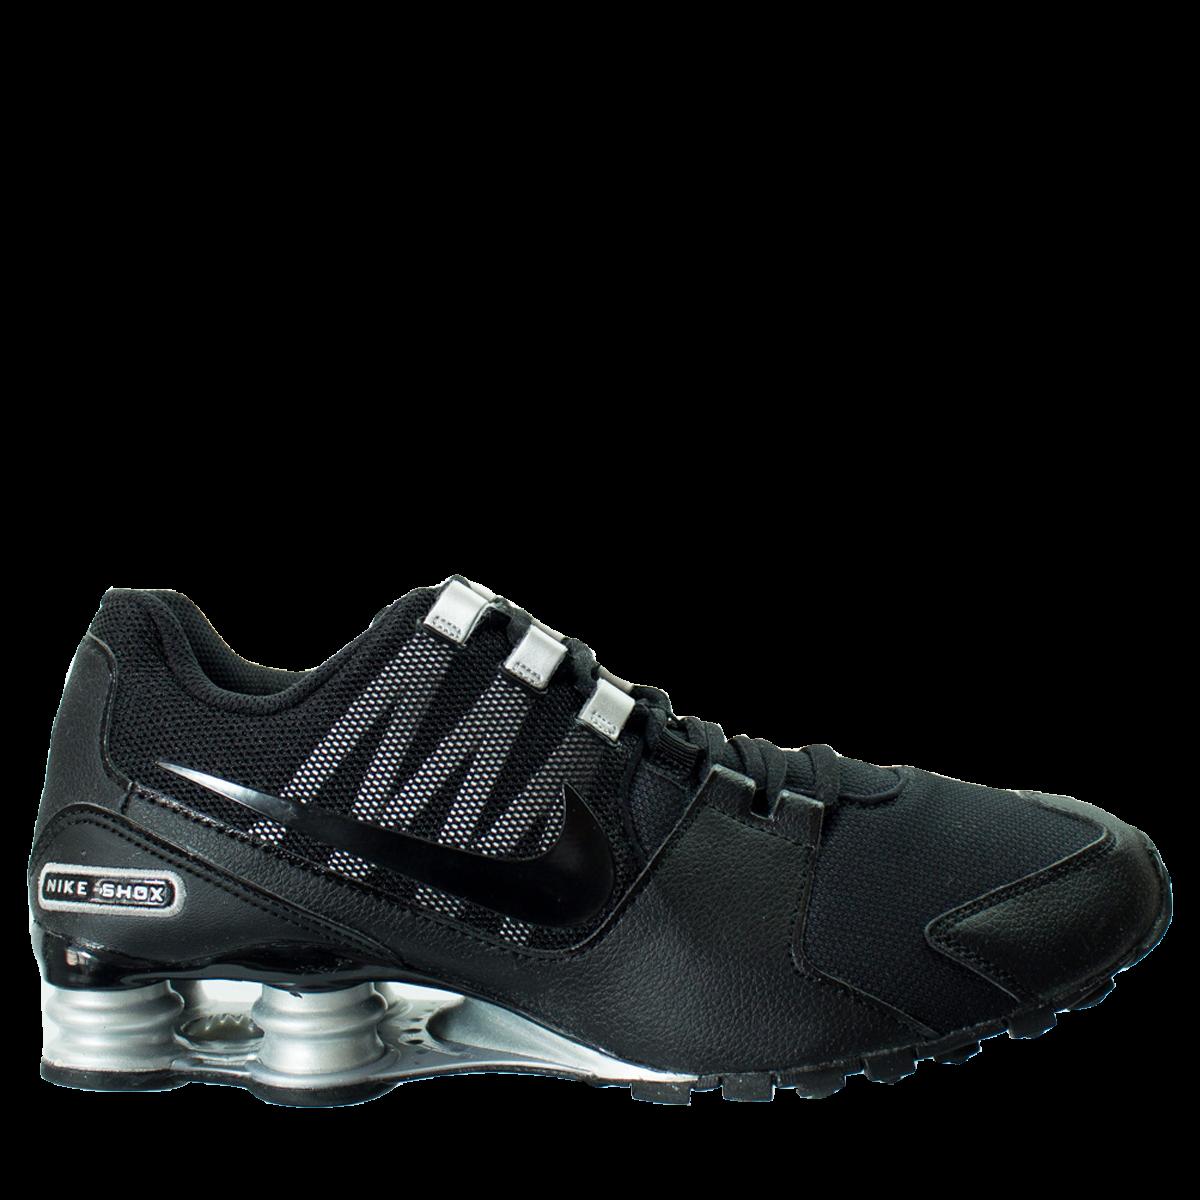 377400f3b53 Bizz Store - Tênis Masculino Nike Shox Avenue